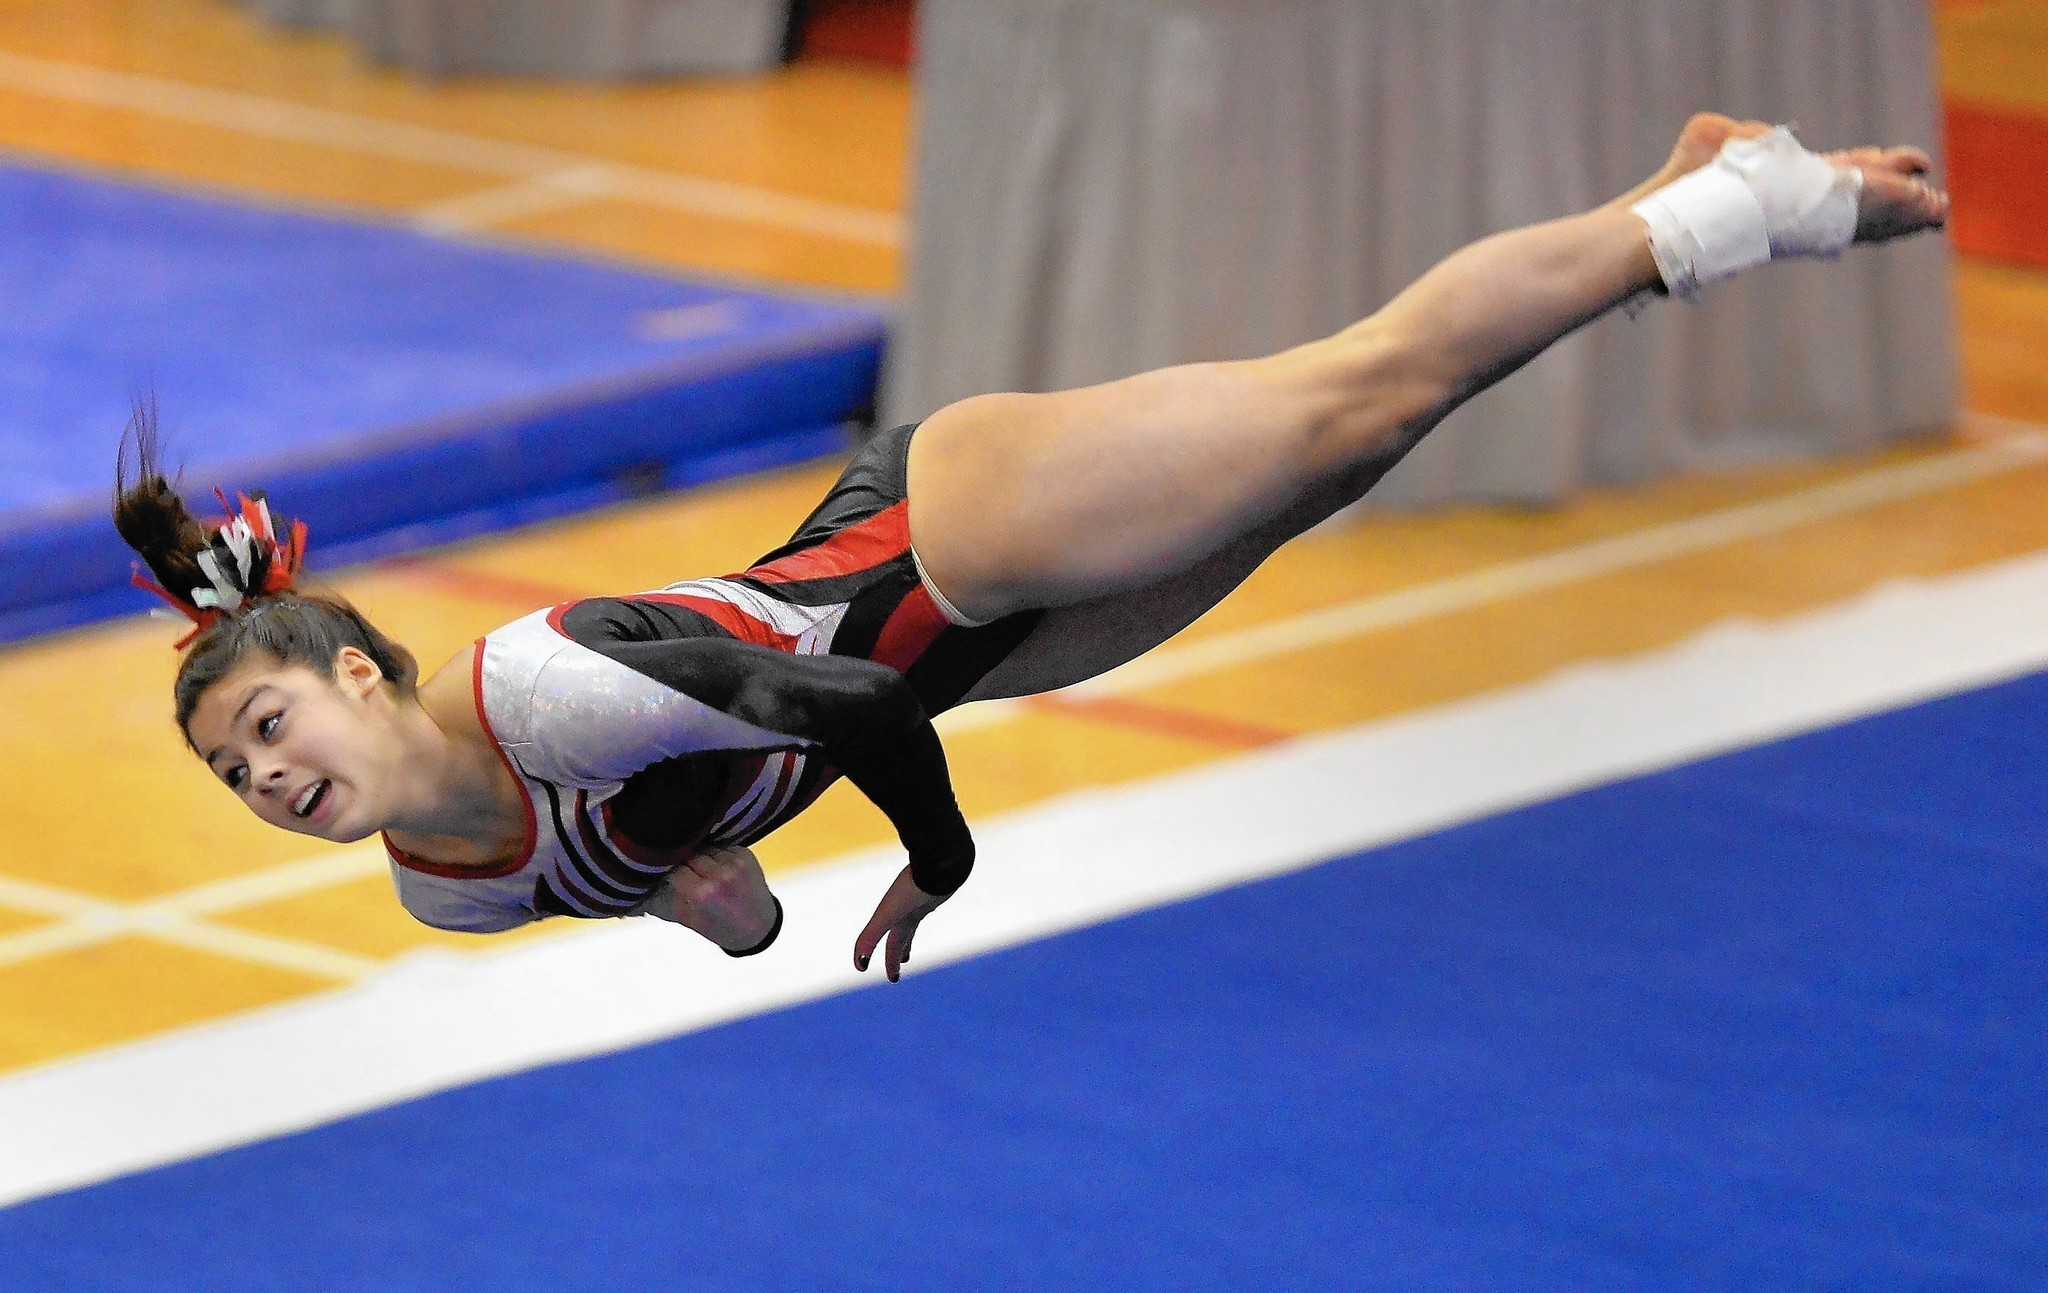 socal gymnastics state meet